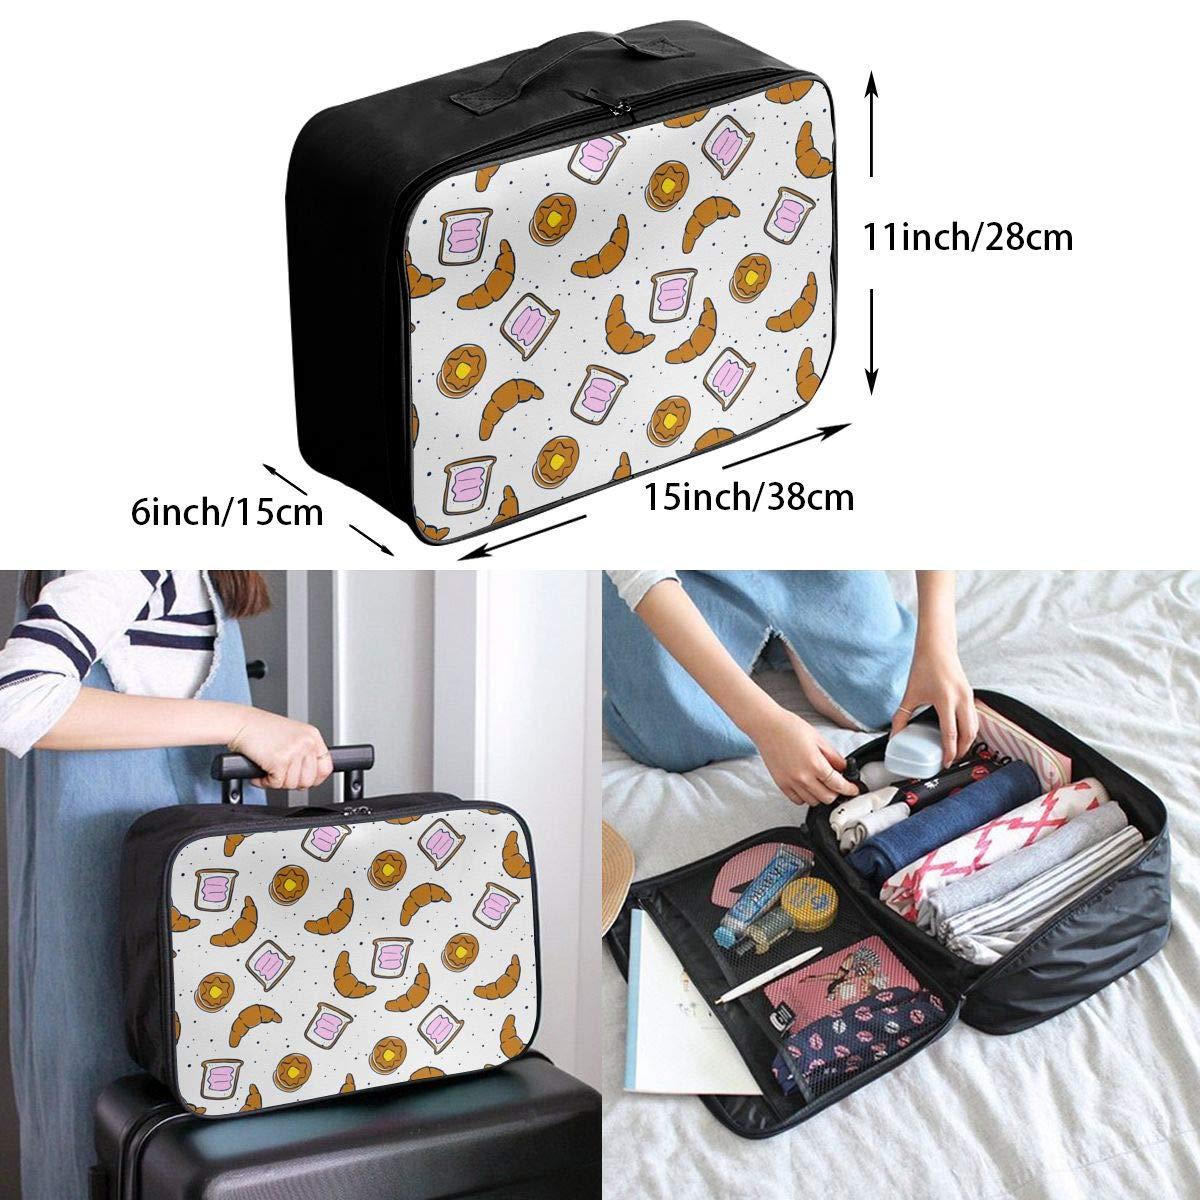 Travel Luggage Duffle Bag Lightweight Portable Handbag Toast Pattern Large Capacity Waterproof Foldable Storage Tote